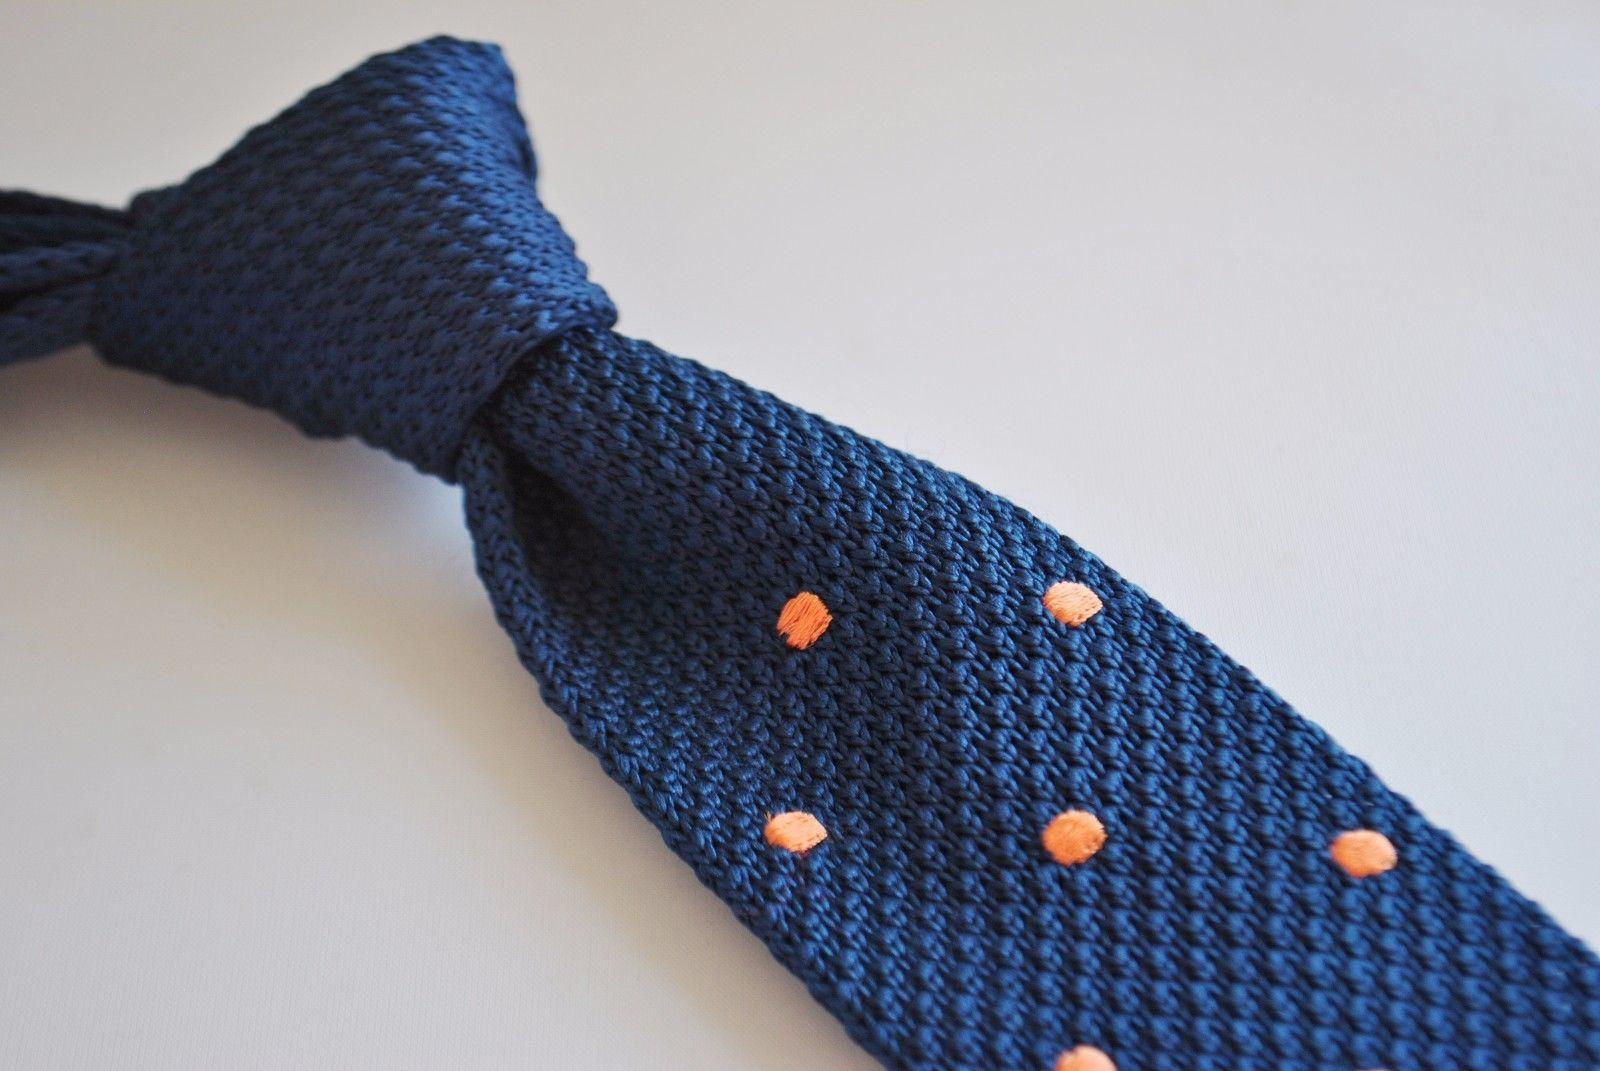 Frederick Thomas Knitted Silk Mens Tie - Dark Navy Blue - Burnt Orange Polka Dot